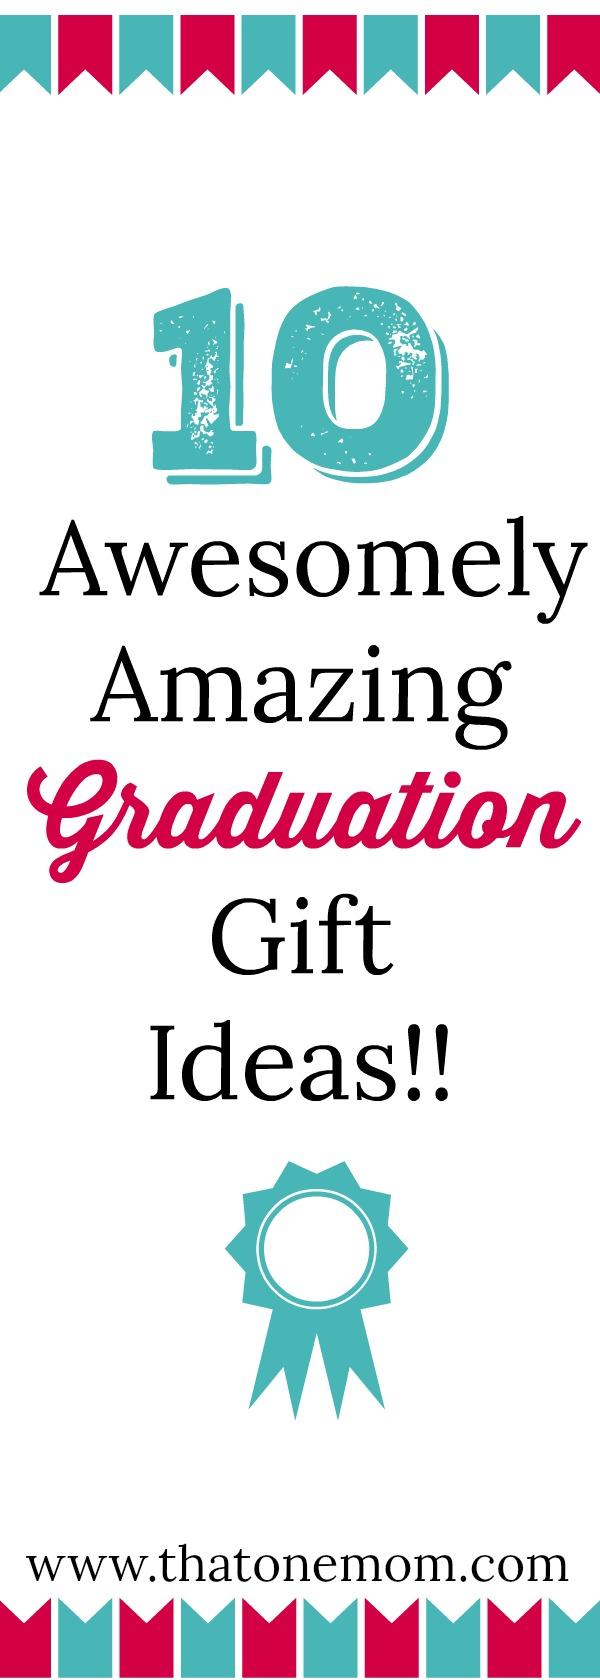 Ten Awesomely Amazing Graduation Gift Ideas!! www.thatonemom.com